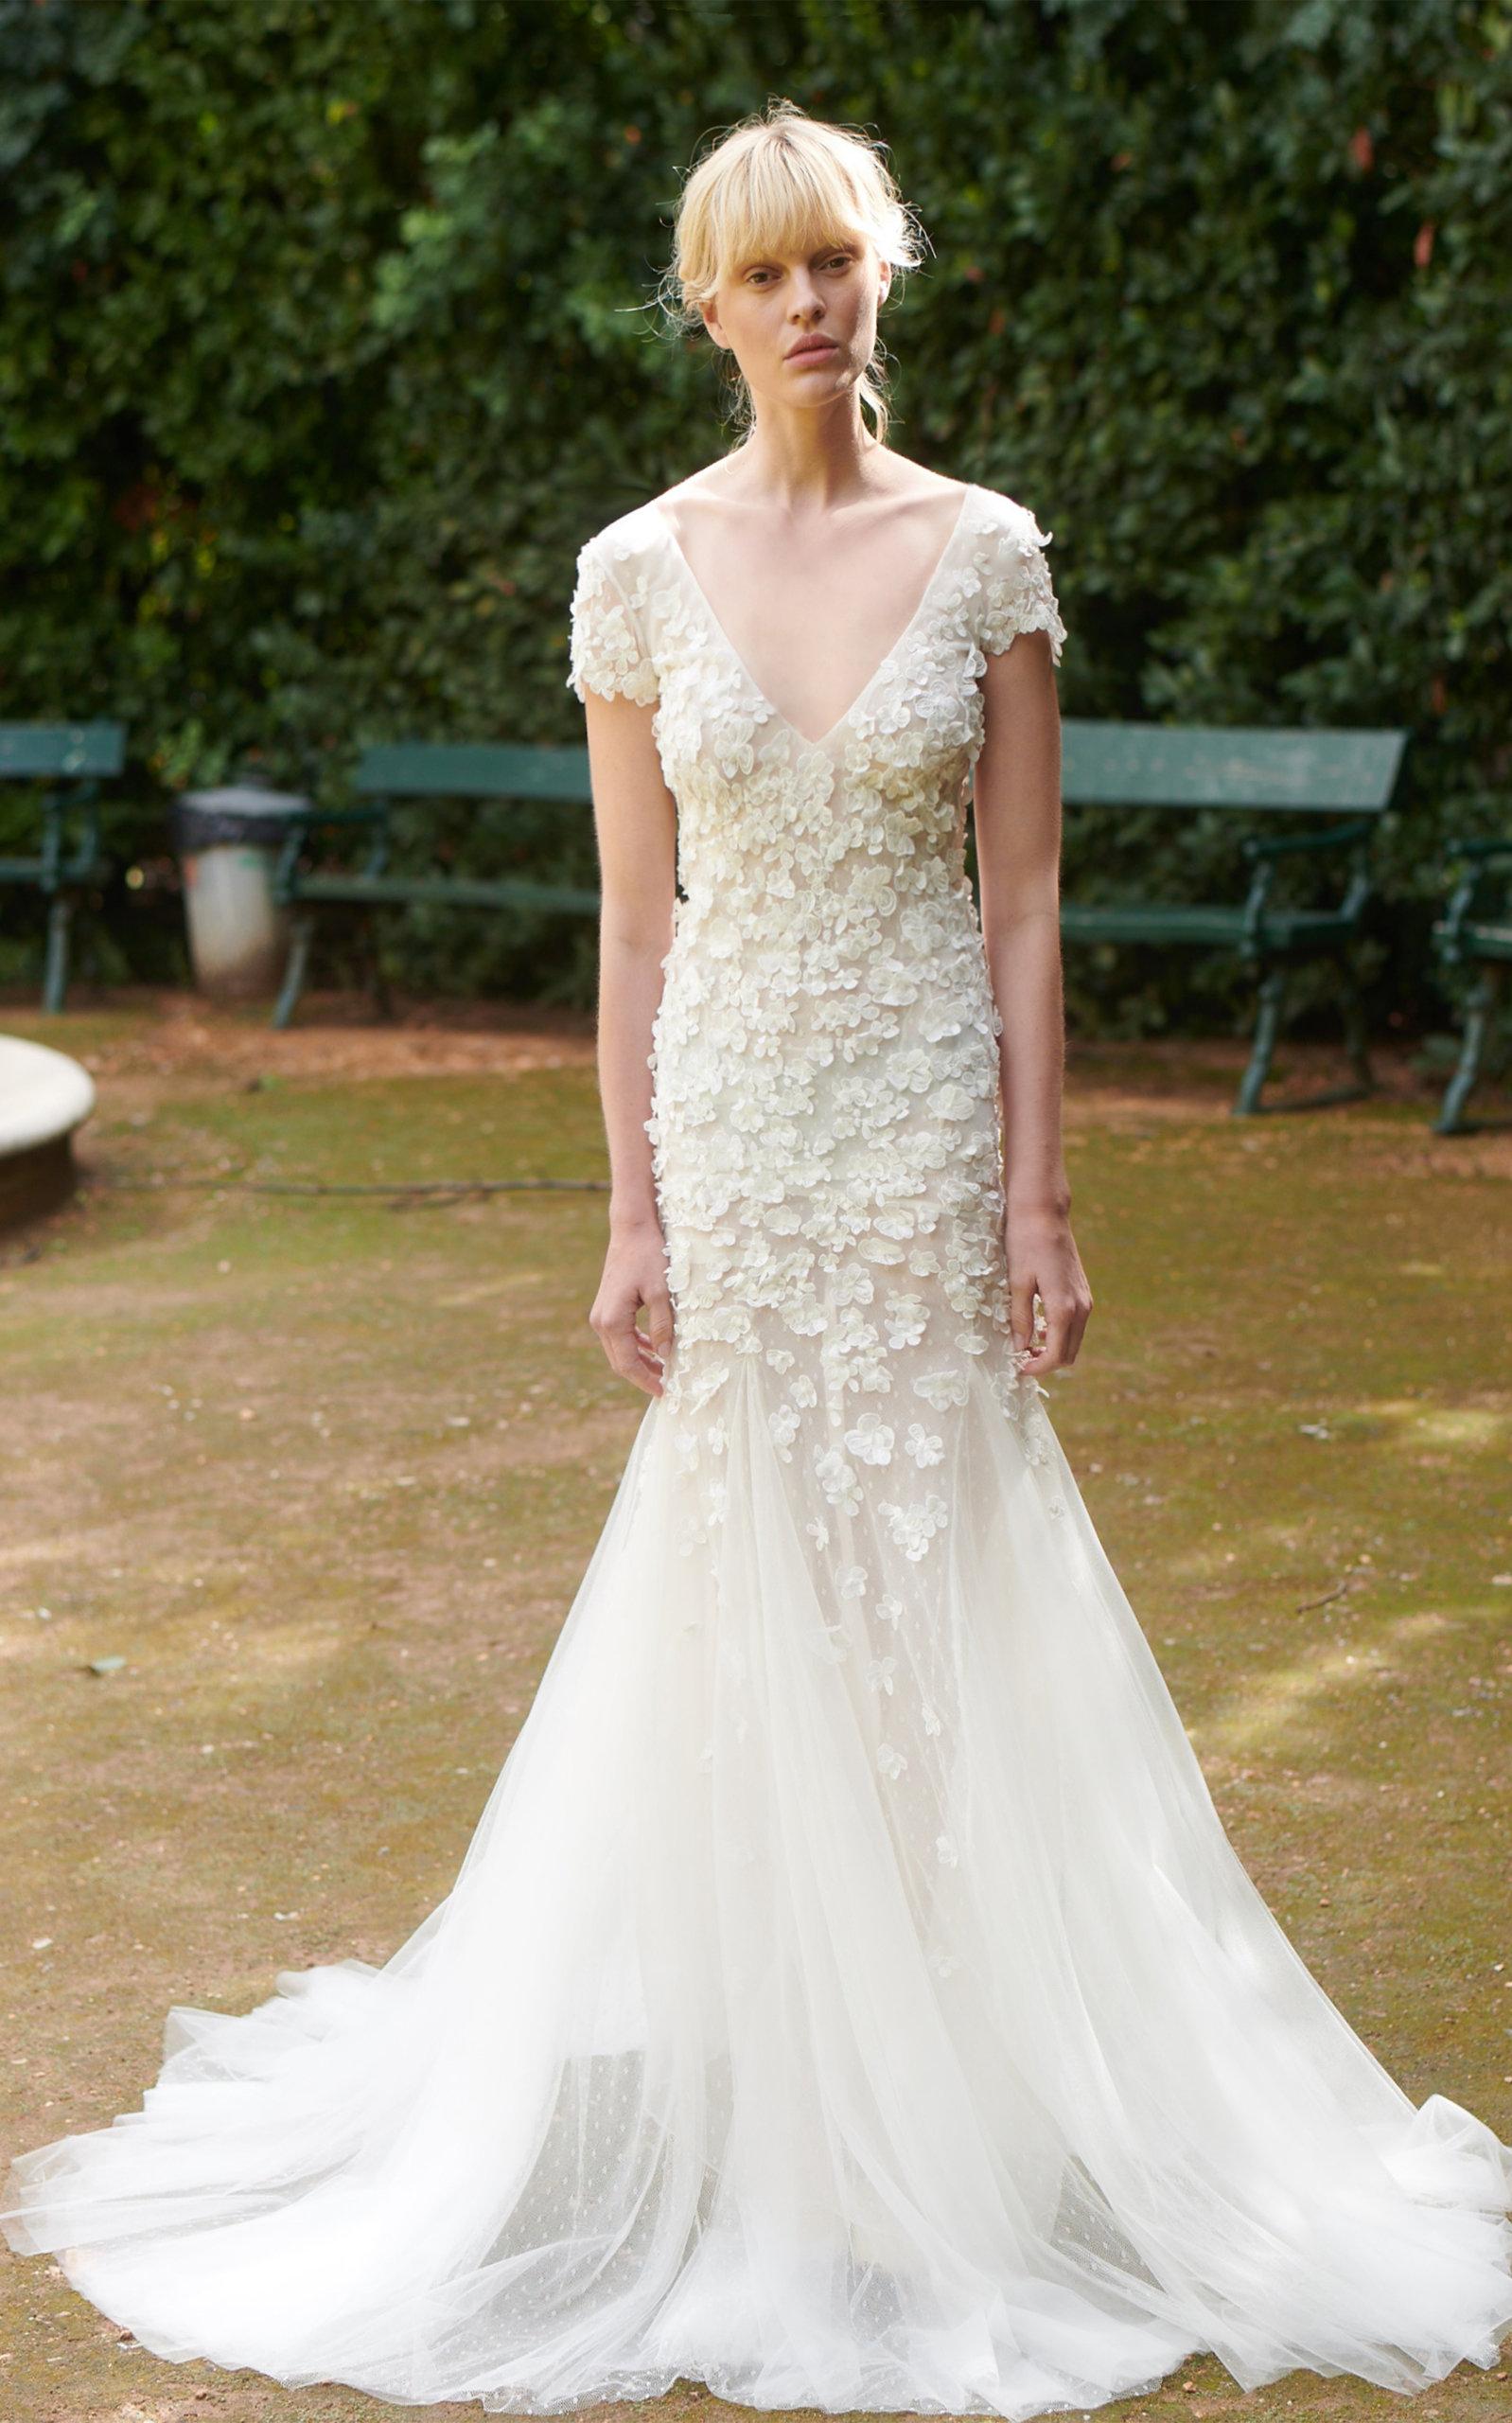 COSTARELLOS BRIDAL V Neckline Flower Embellished Mermaid Gown in White